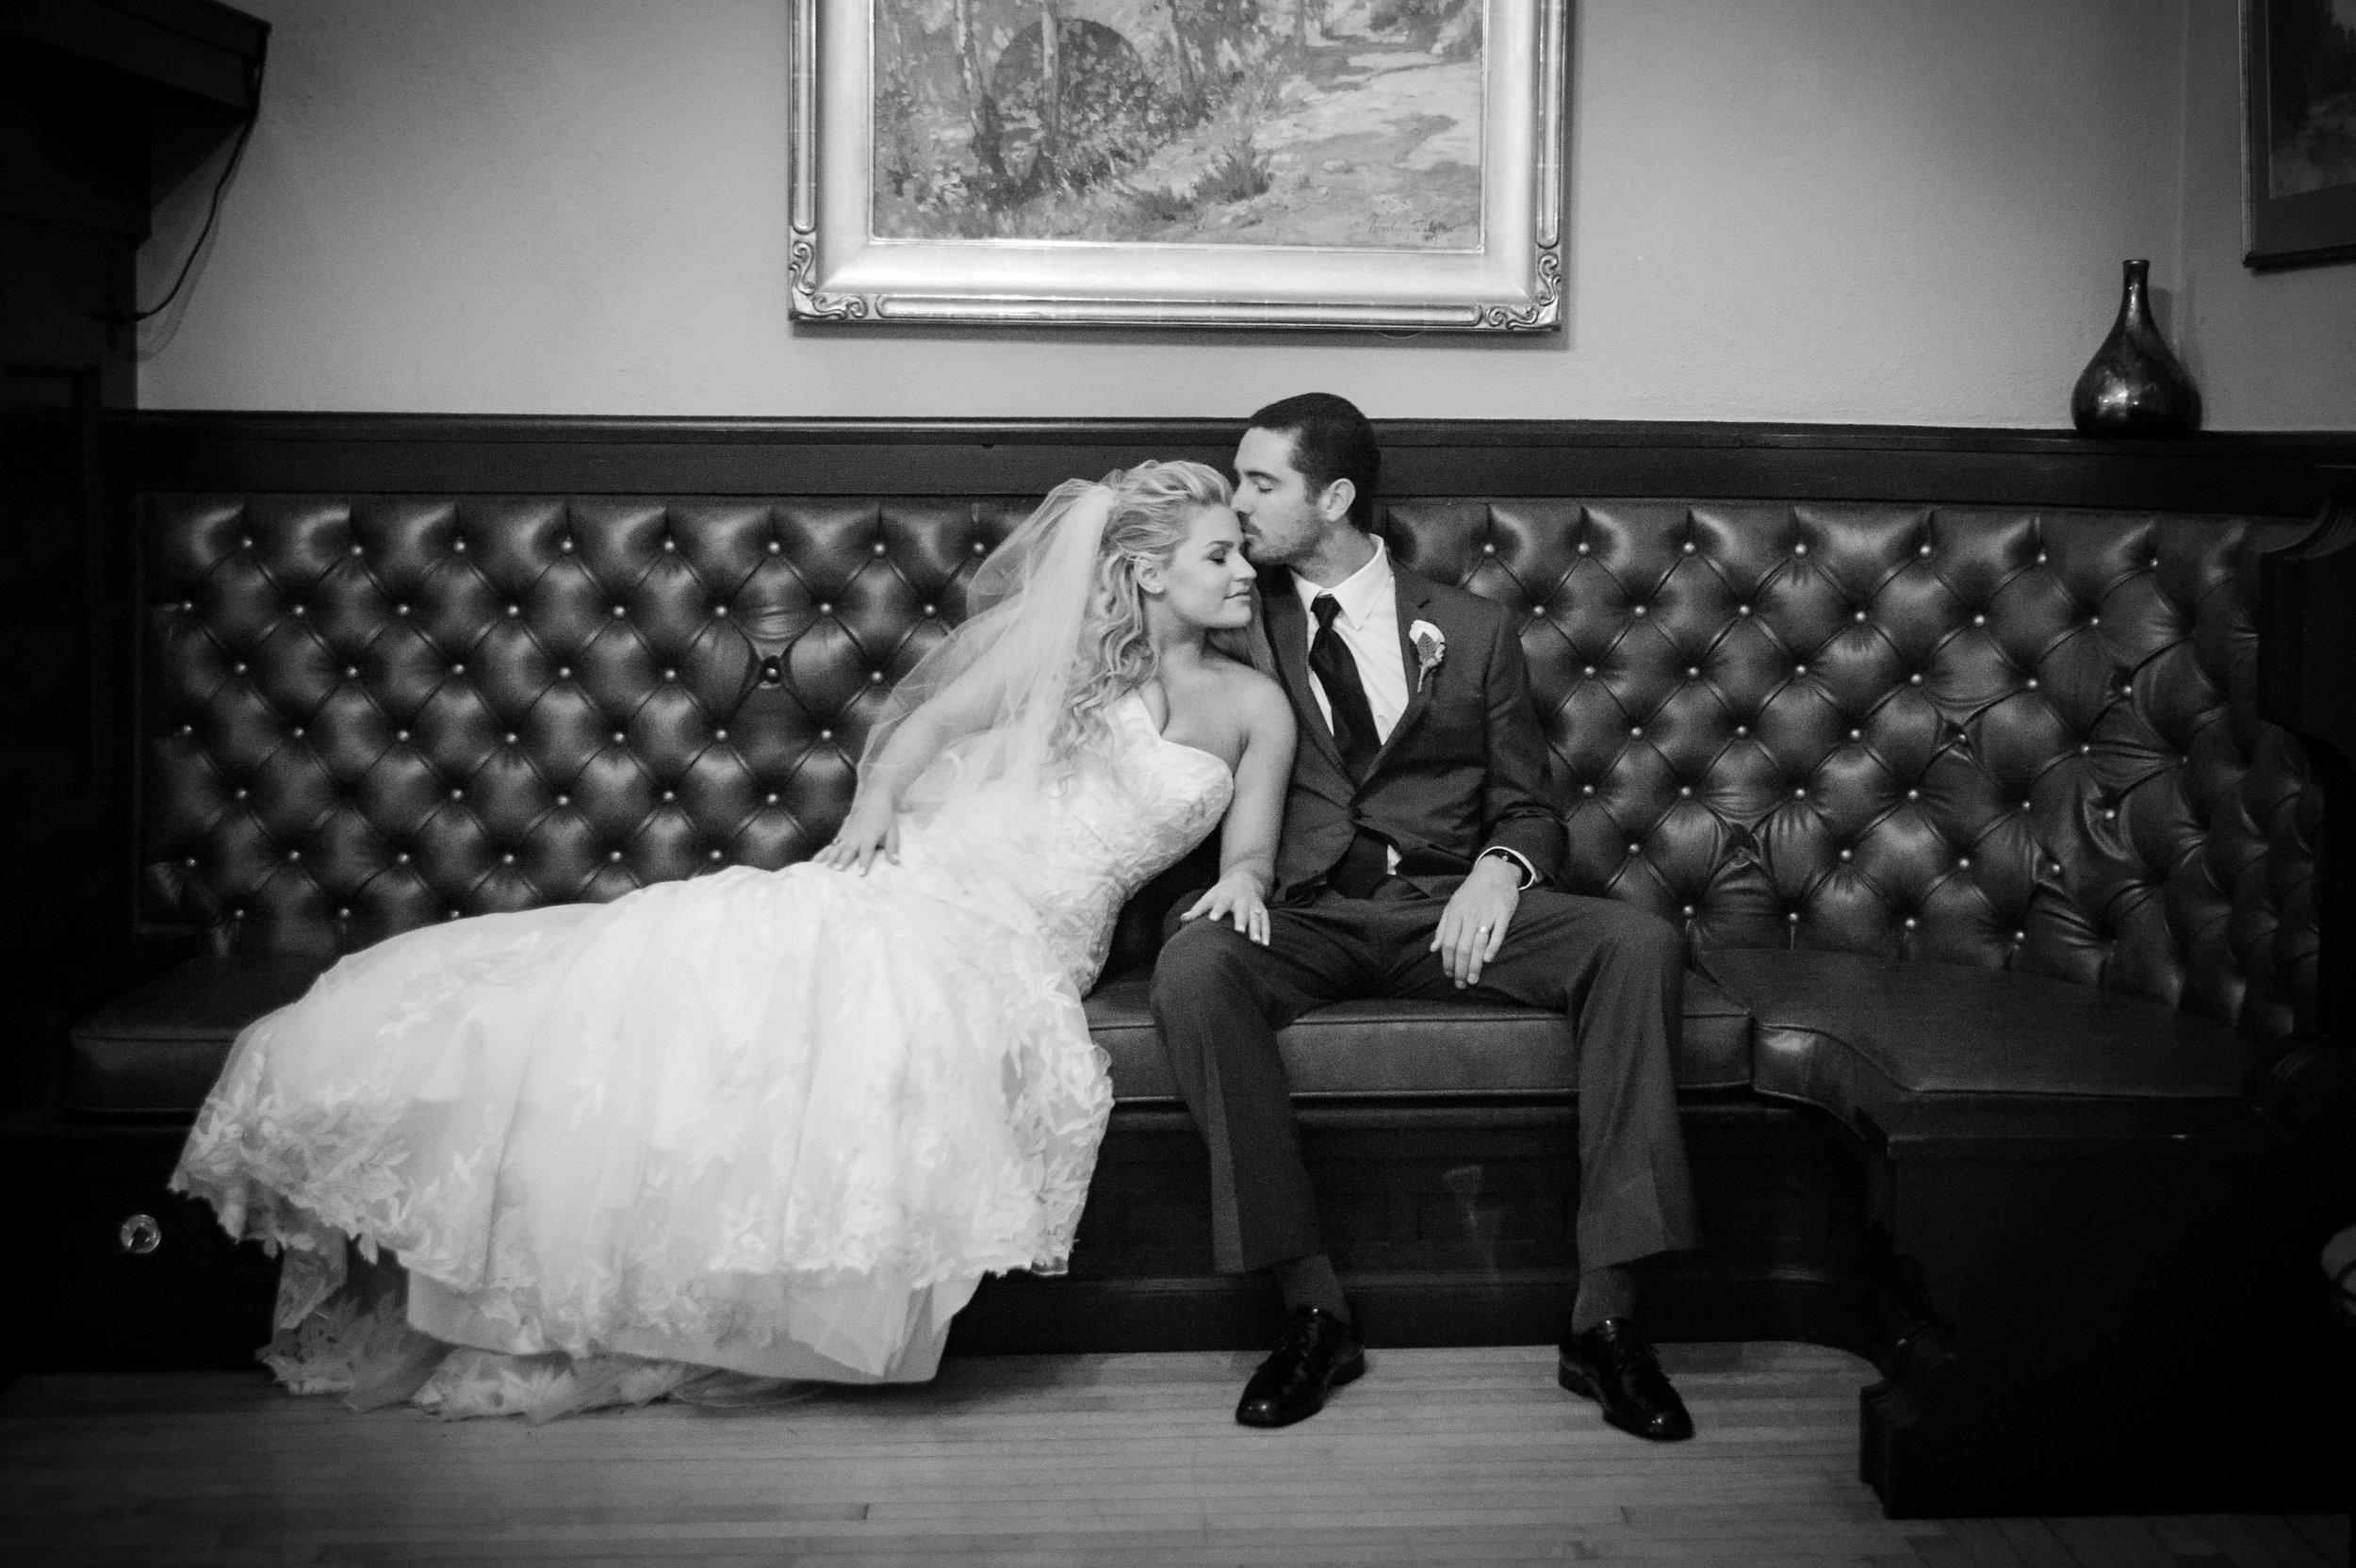 www.santabarbarawedding.com | ByCherry Photography | The Santa Barbara Club | Wedding Venue | Private Estate | Bride and Groom